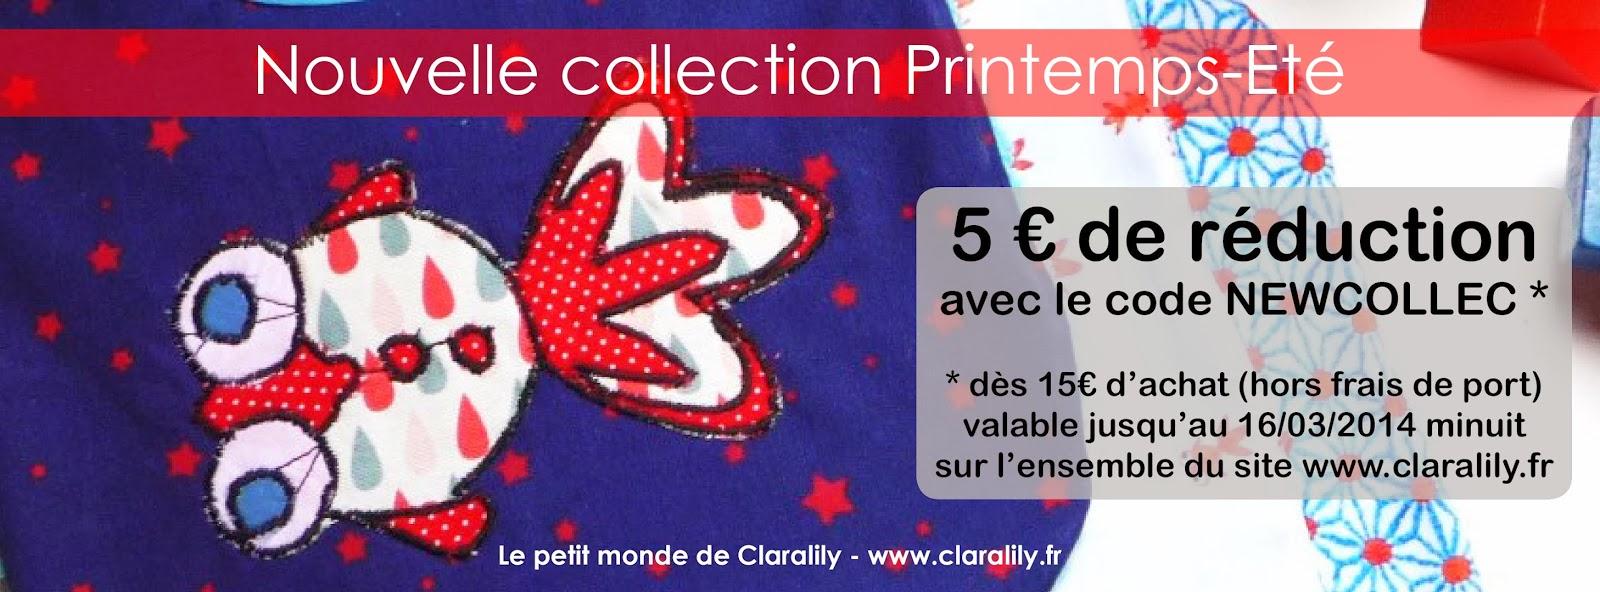 www.claralily.fr